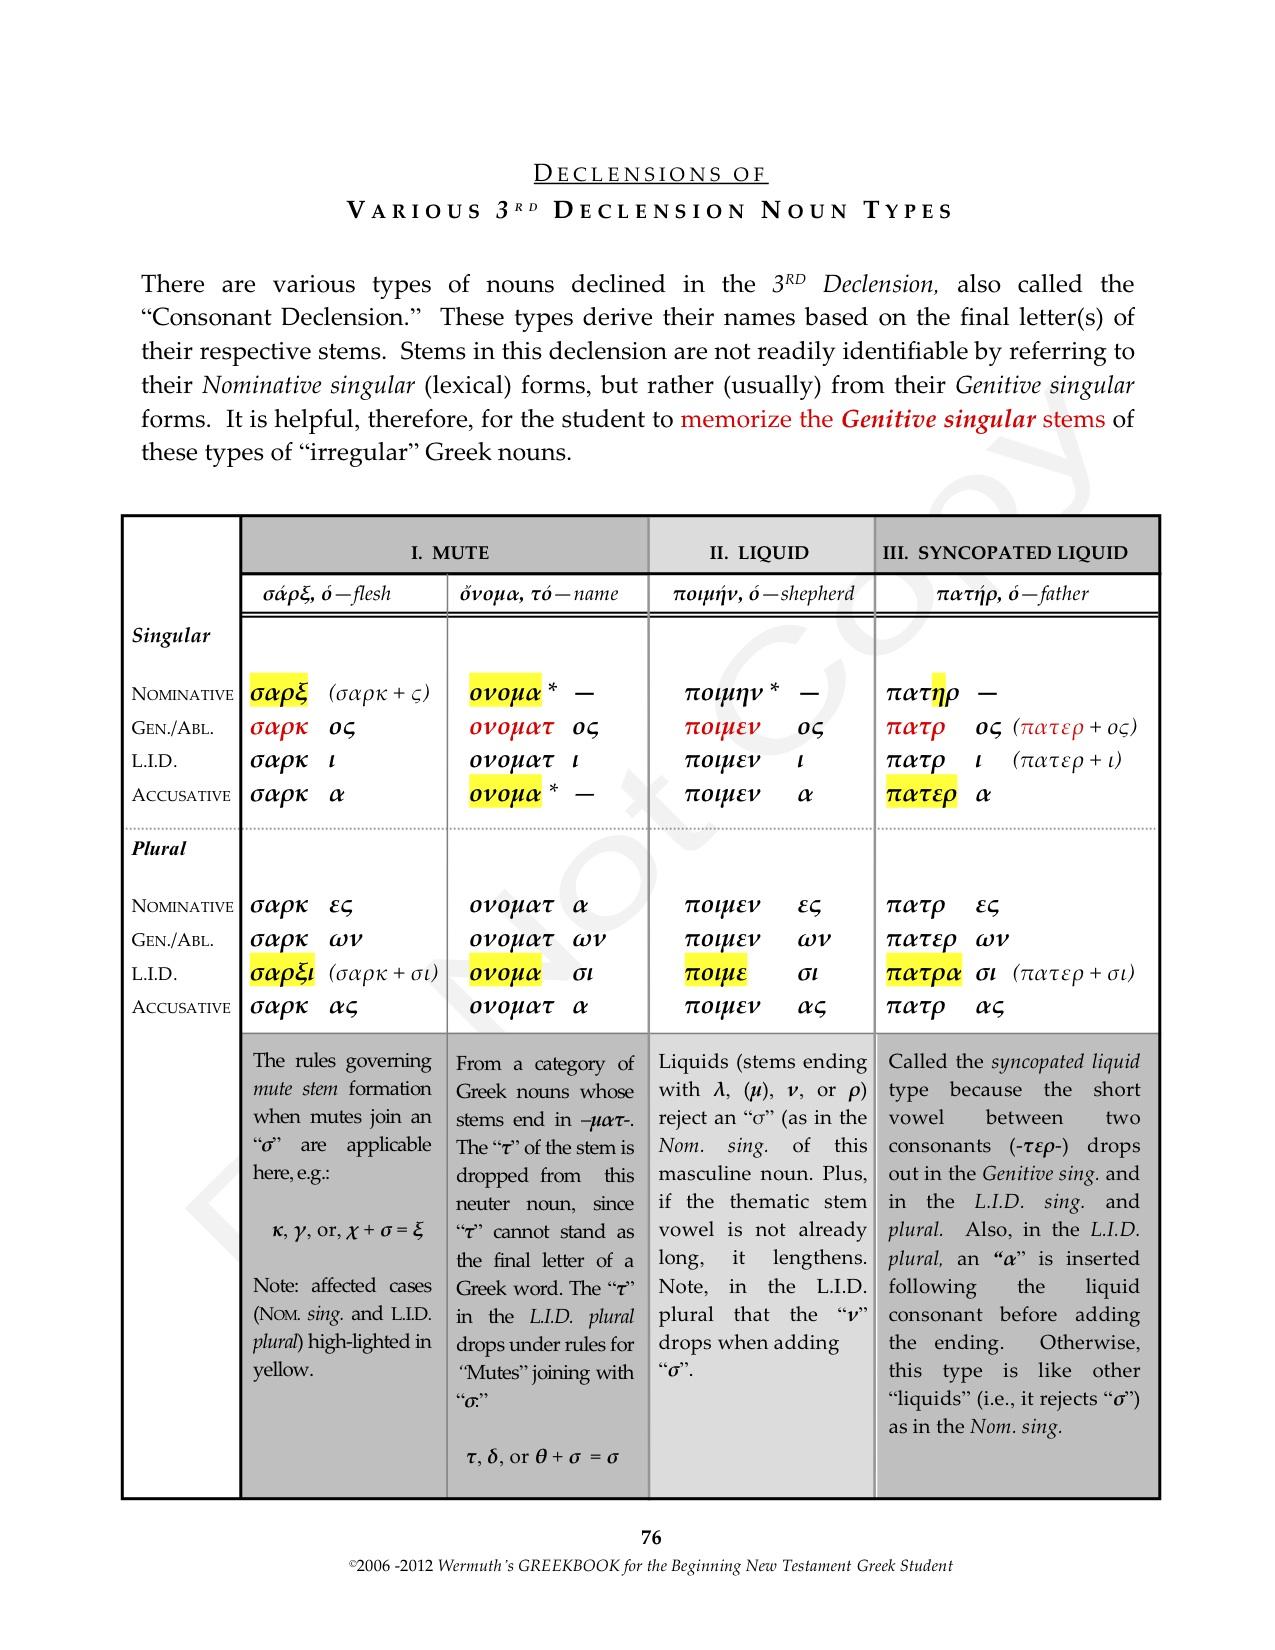 3rd Declension Greek Nouns